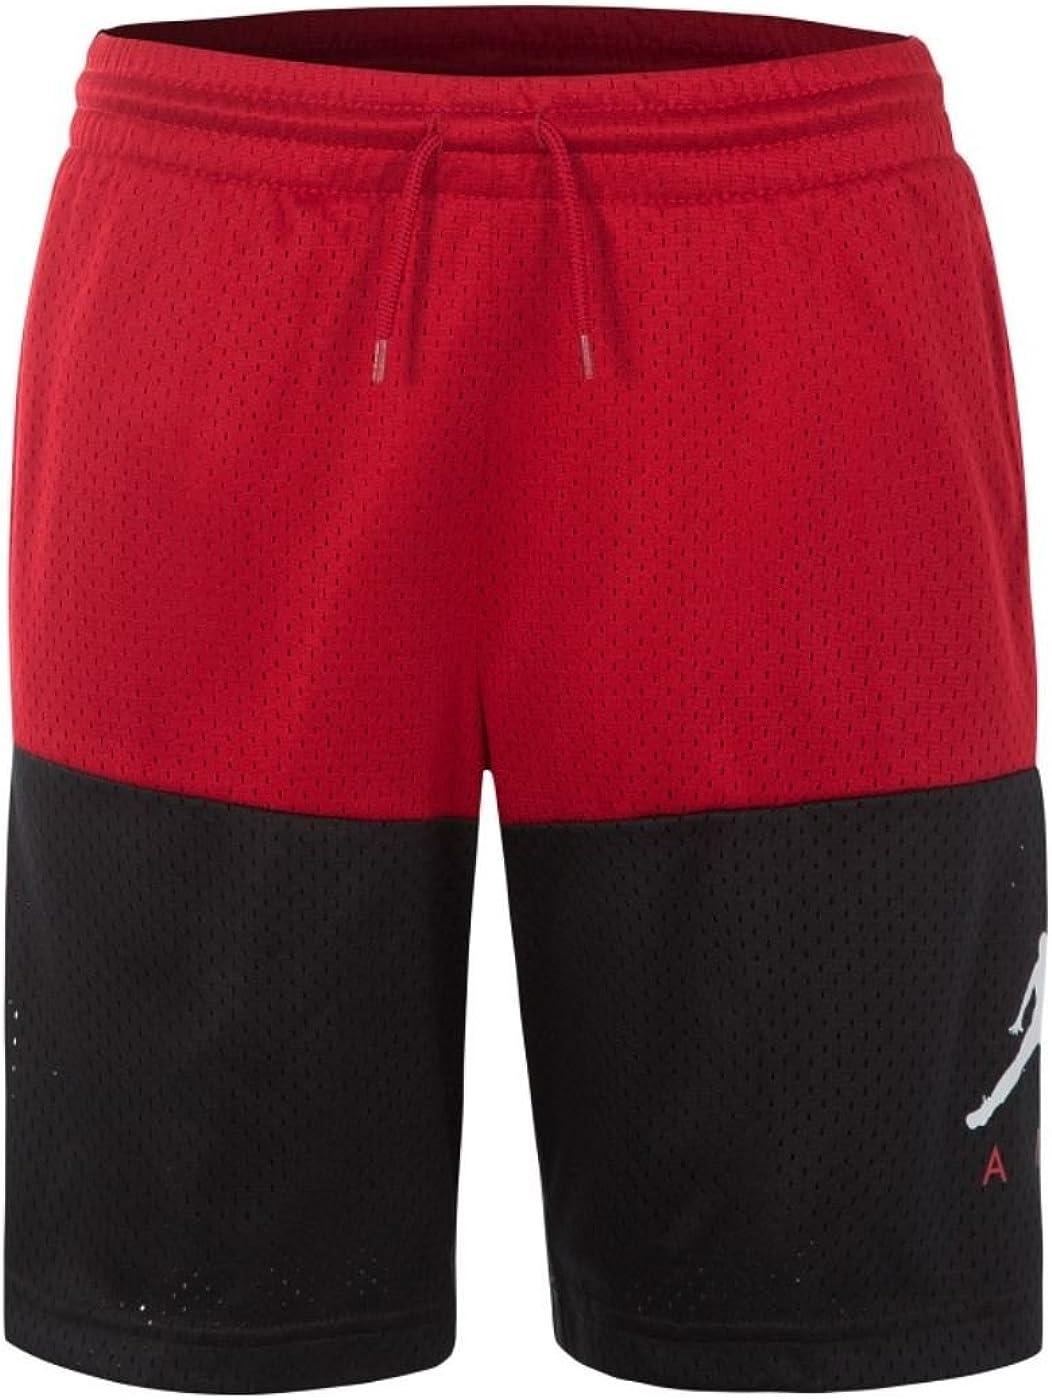 Jordan Boys Mesh Shorts Size X-Large